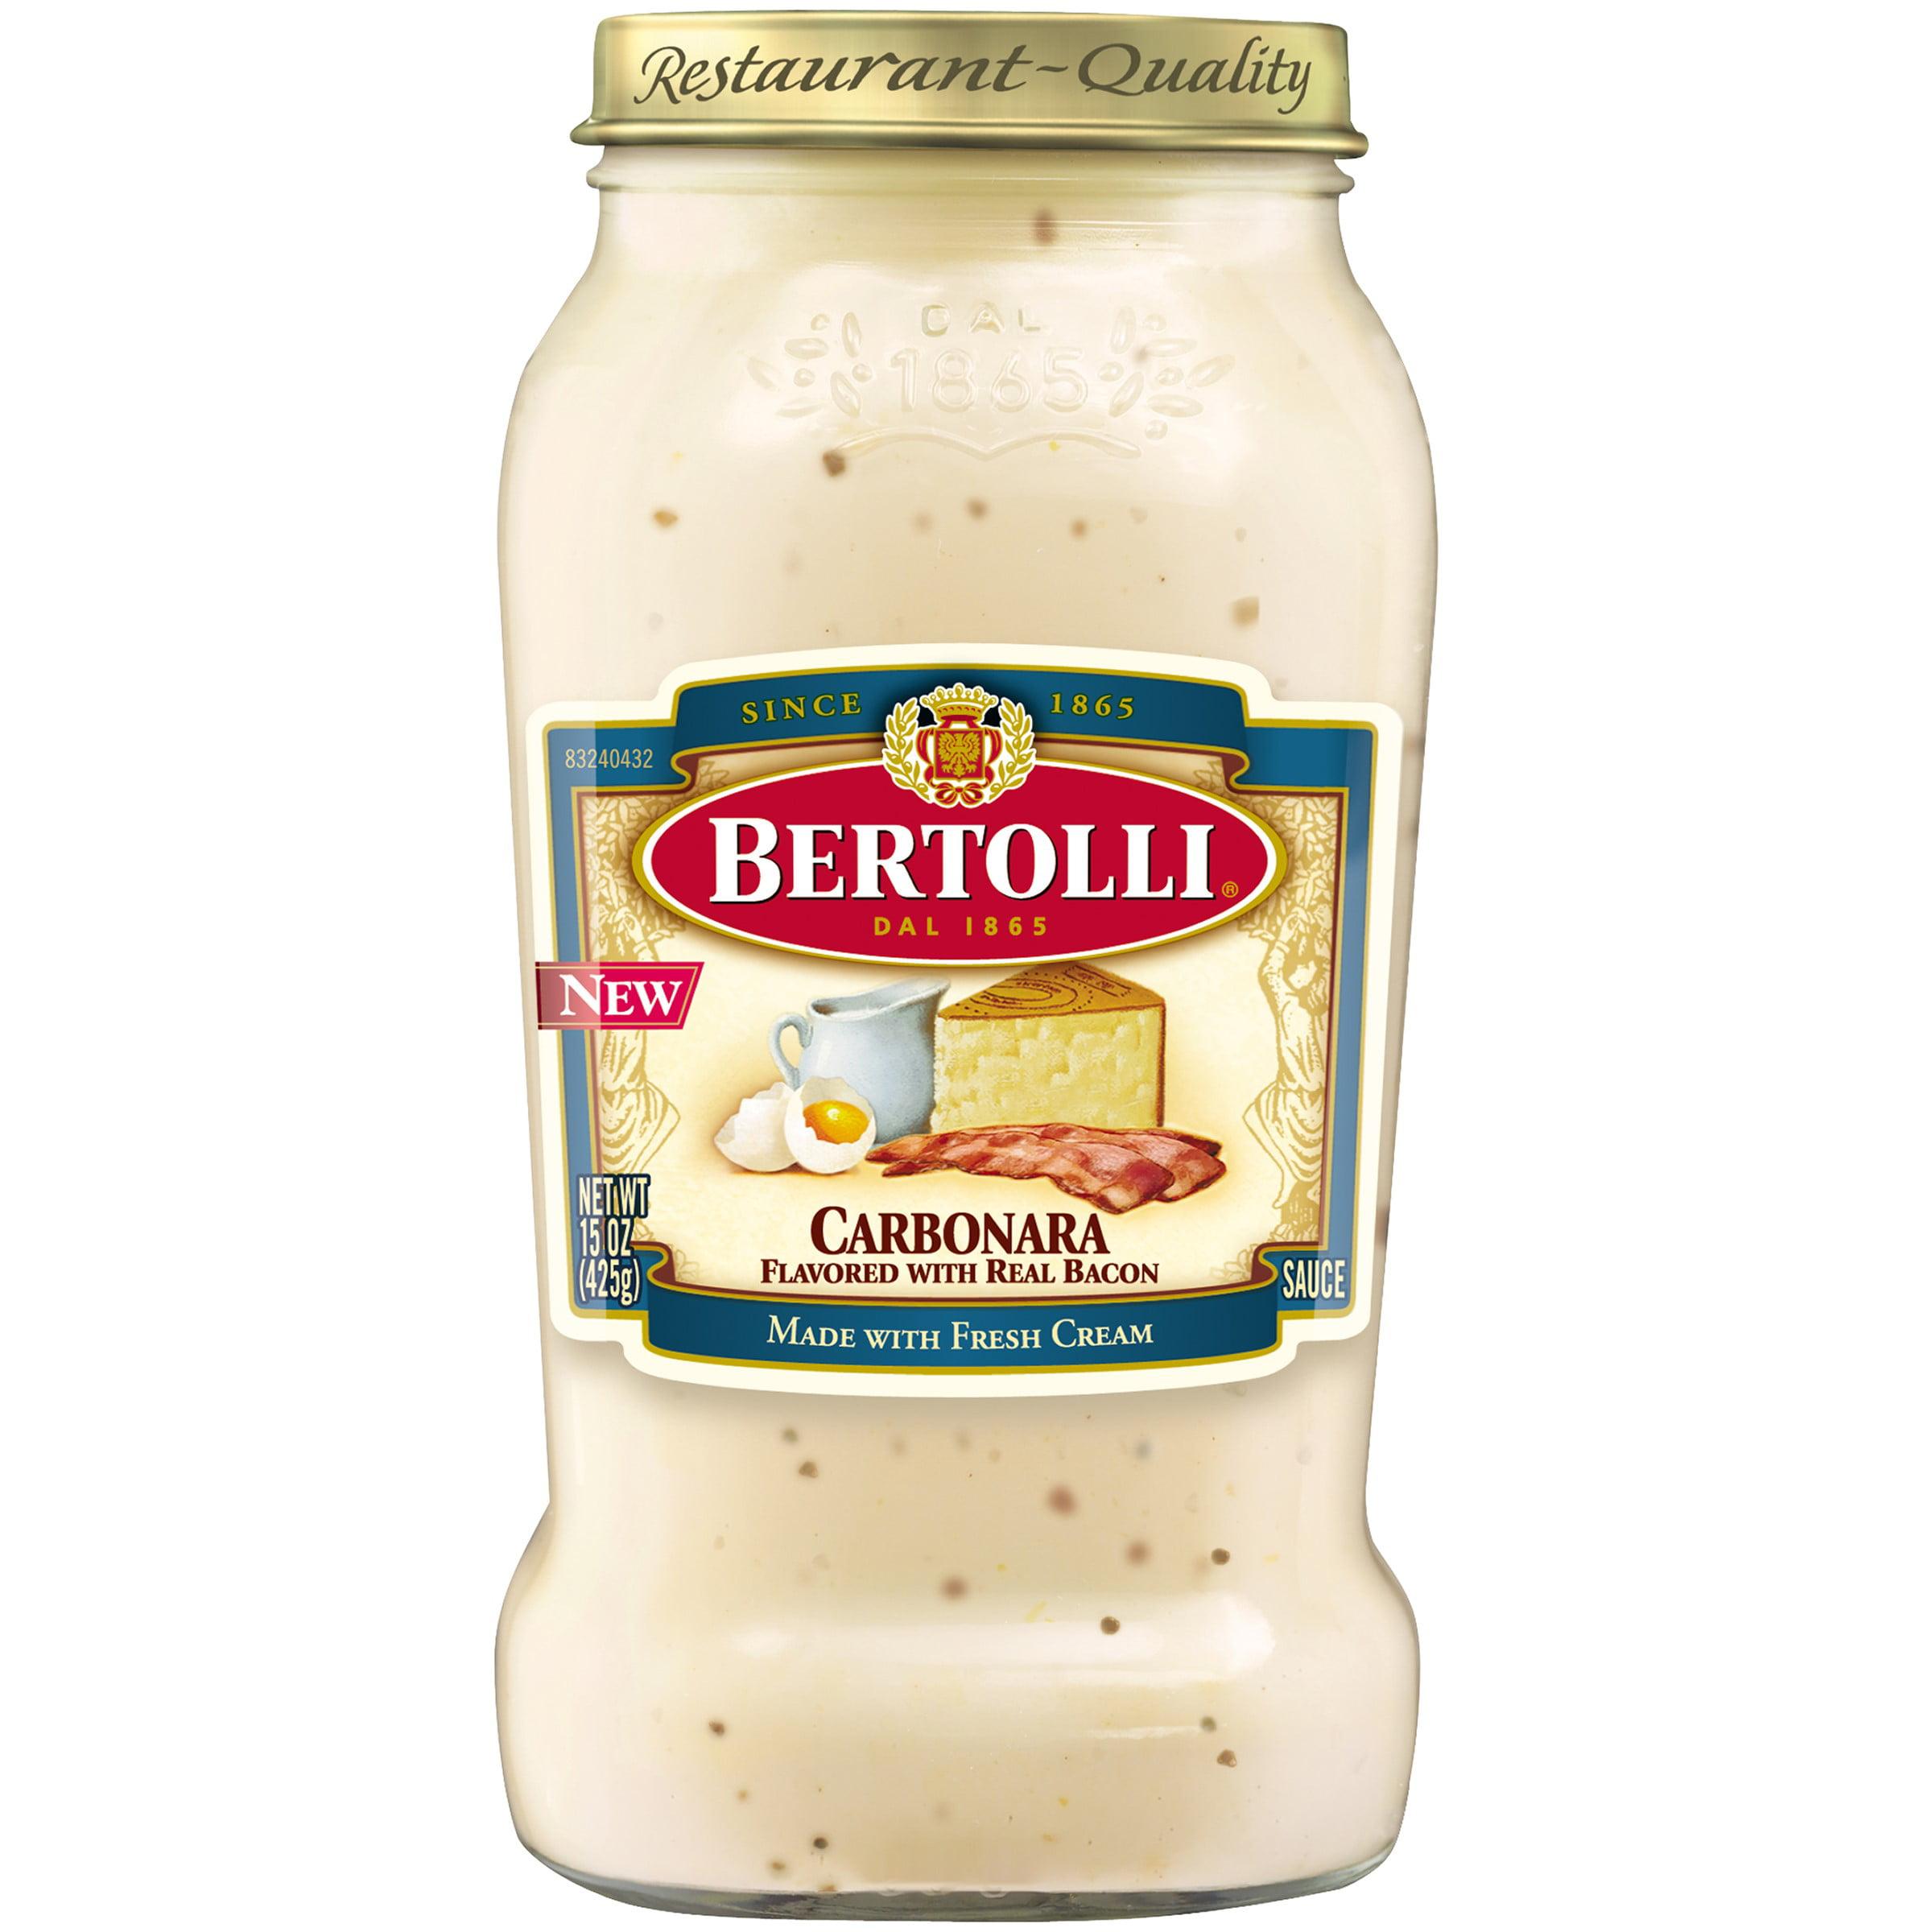 Bertolli Carbonara Sauce, Smokey Bacon, 15 Oz Bottle